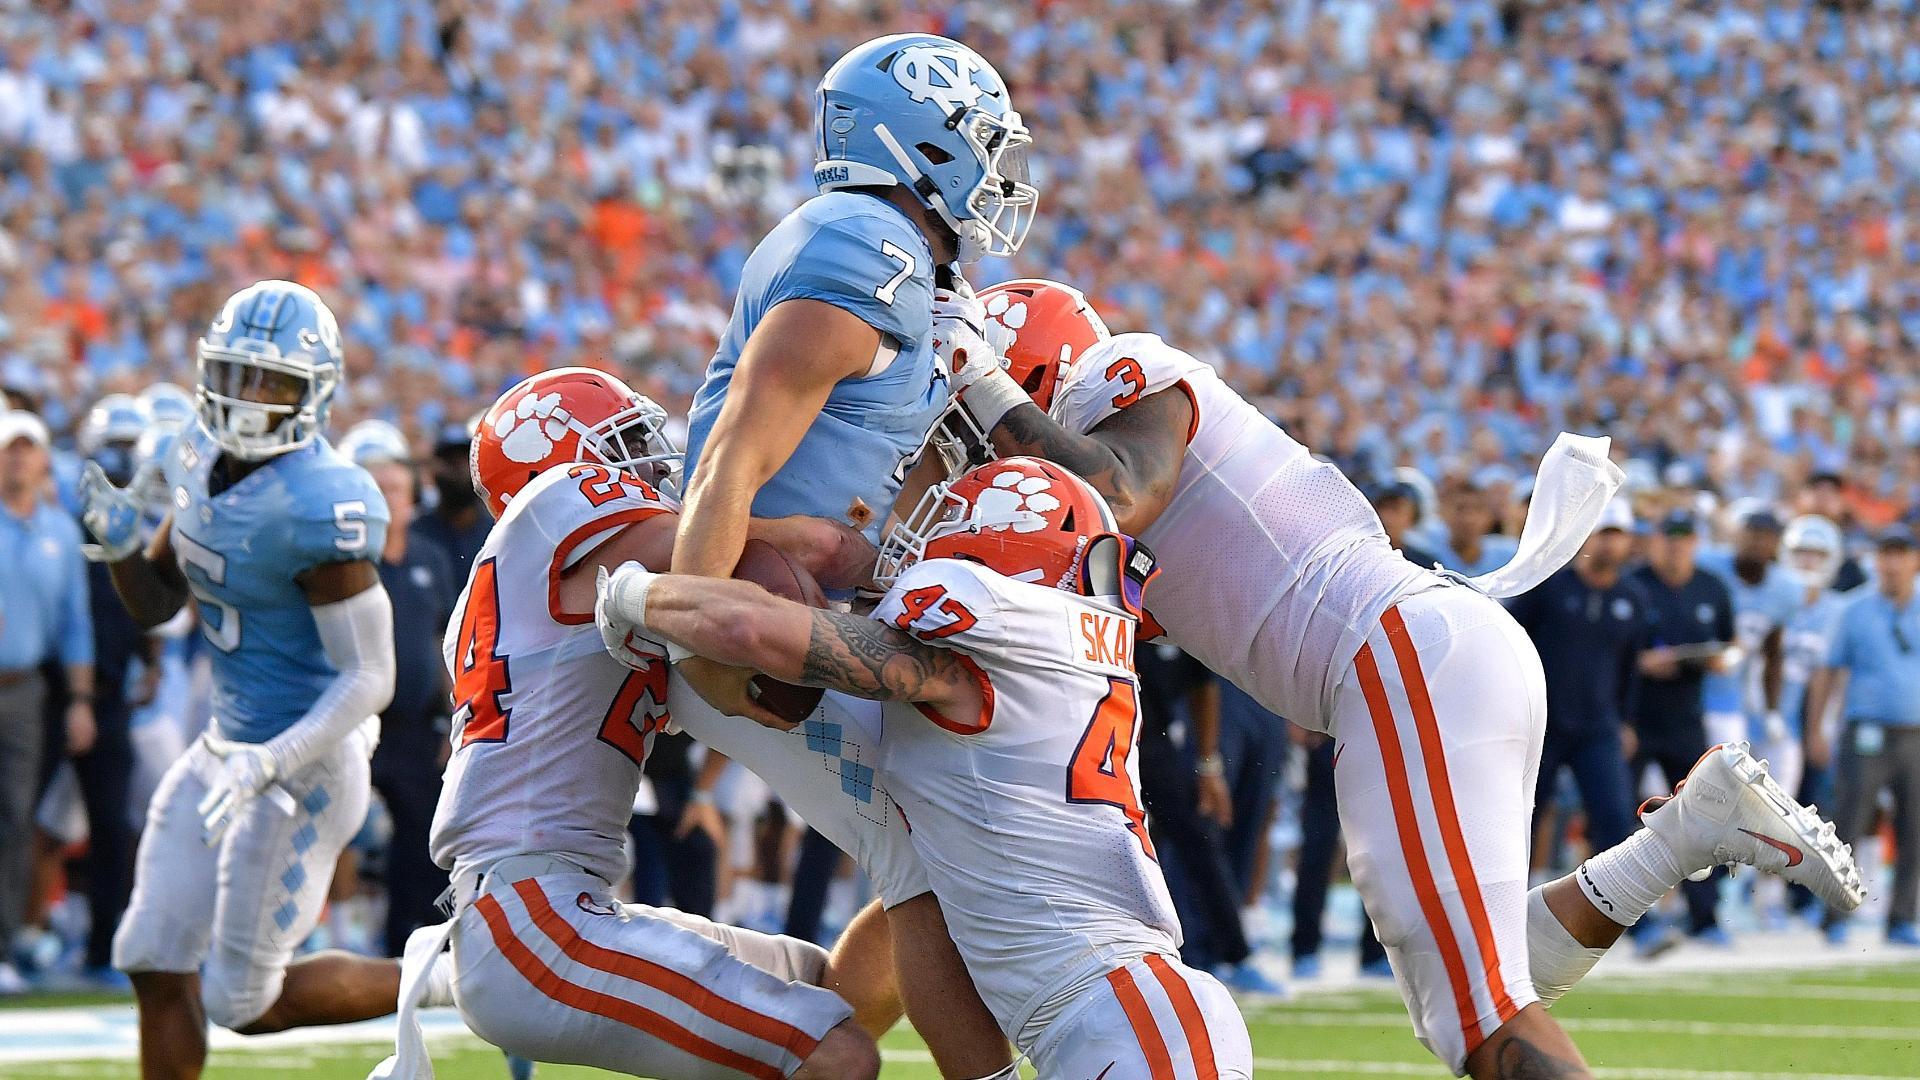 North Carolina scores TD, fails on 2-pt conversion to go ahead